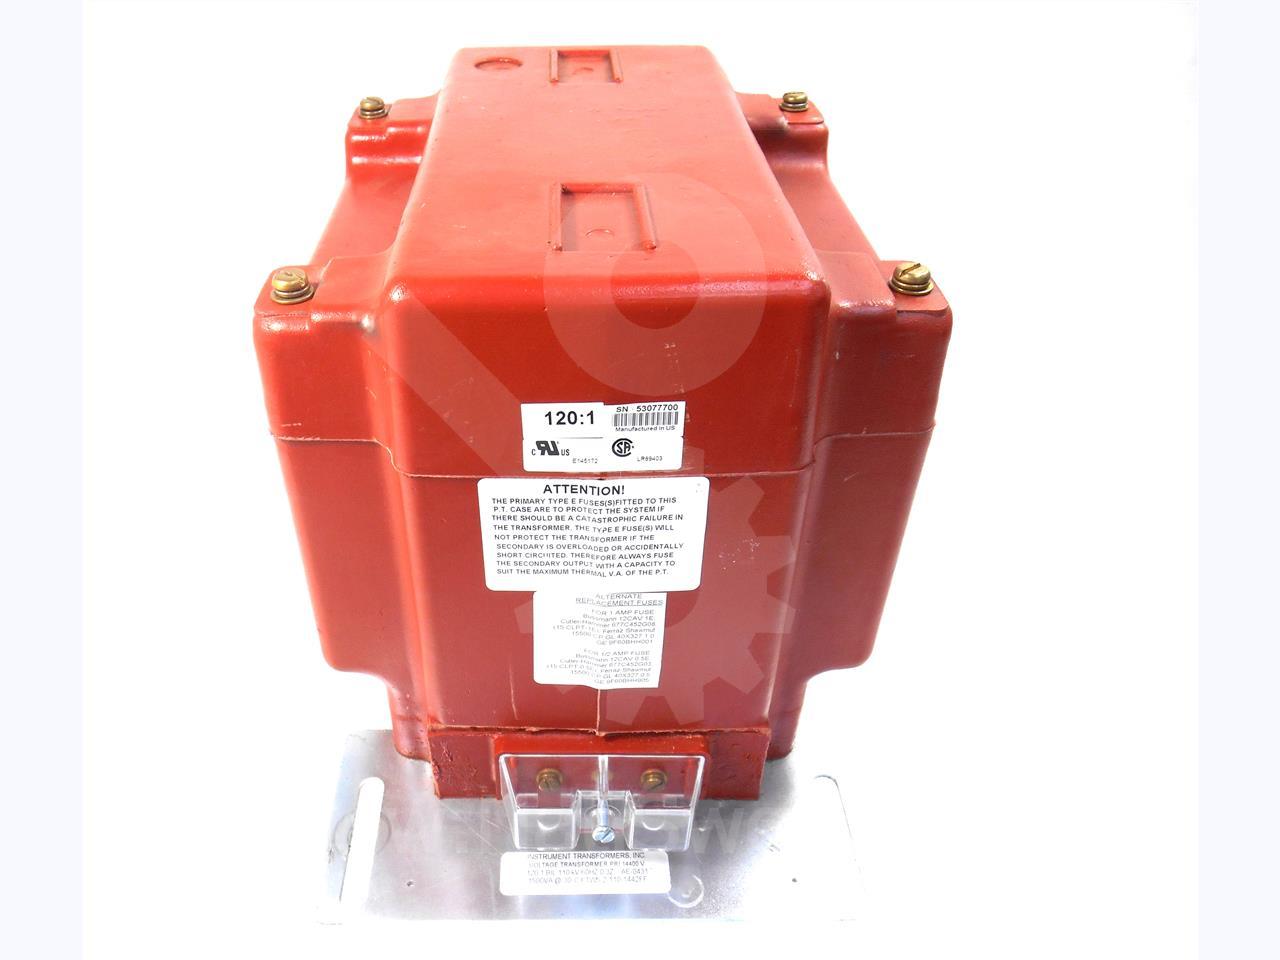 Instrument Transformer ITI 120:1 PTW-5 POTENTIAL TRANSFORMER